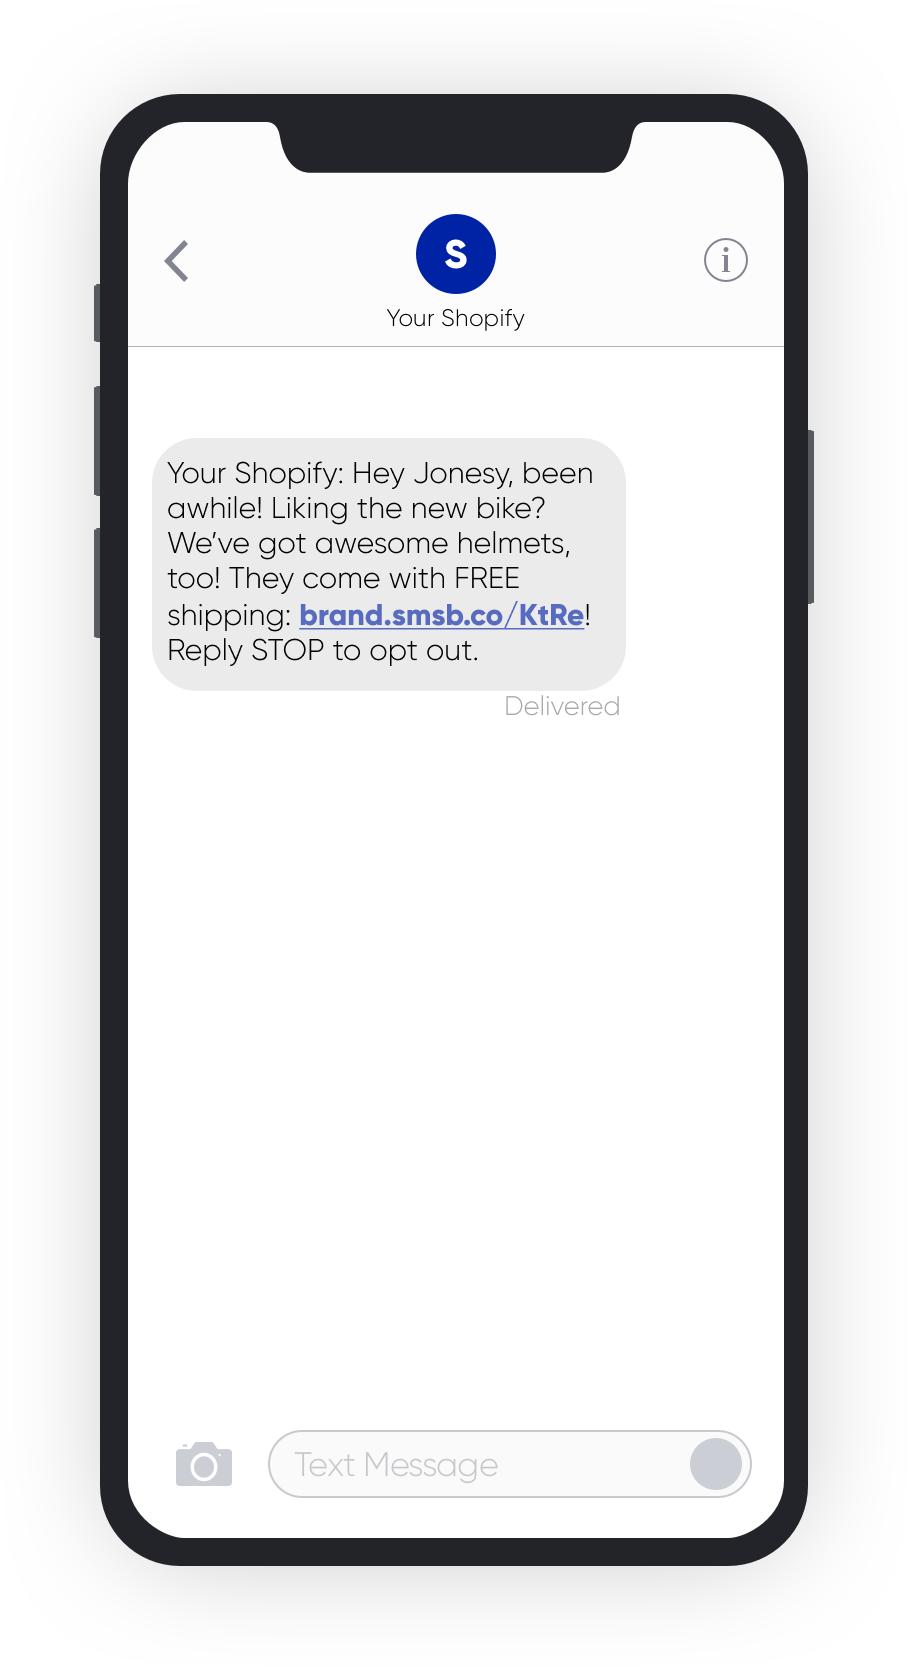 example_customer_winback_SMSBump